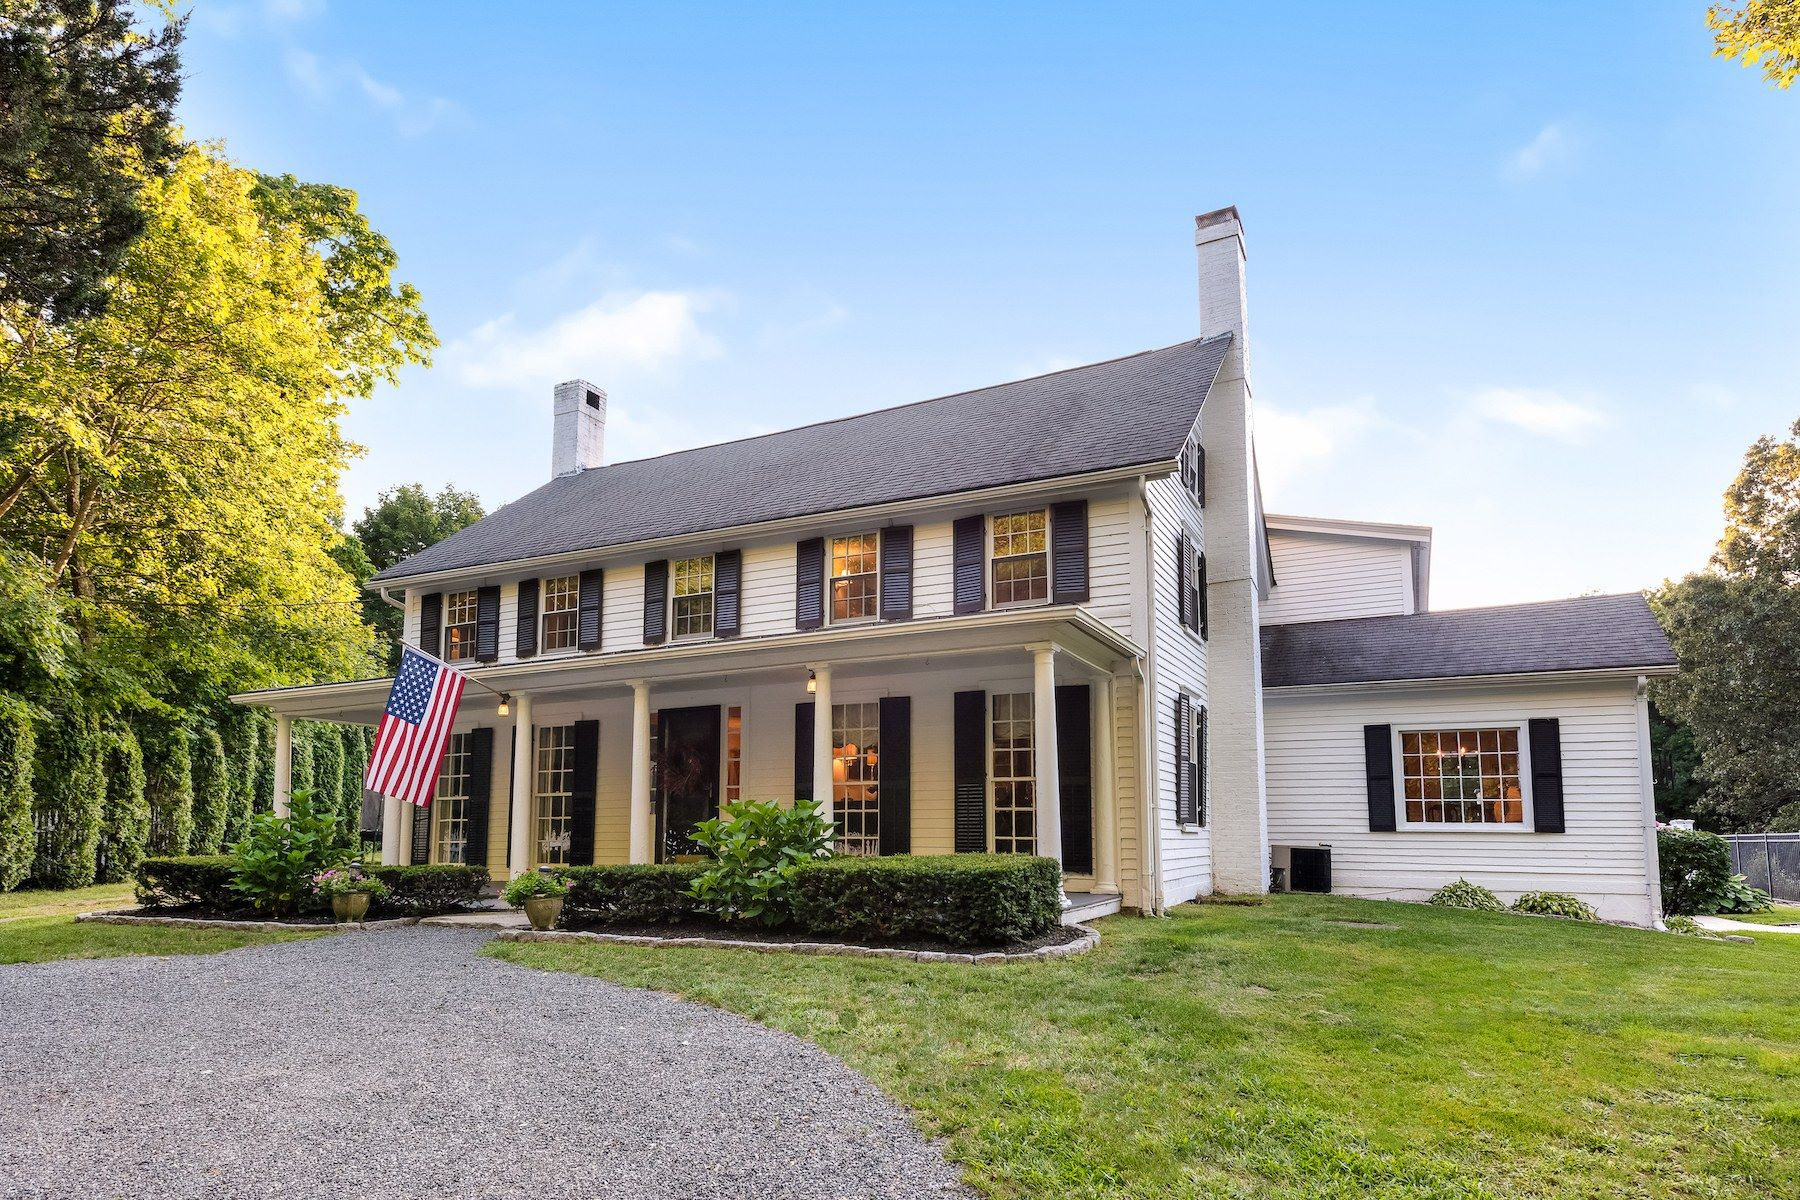 Single Family Homes 为 销售 在 809 Pound Hill Road, North Smithfield, RI 809 Pound Hill Road 北史密斯菲尔德, 罗得岛 02896 美国